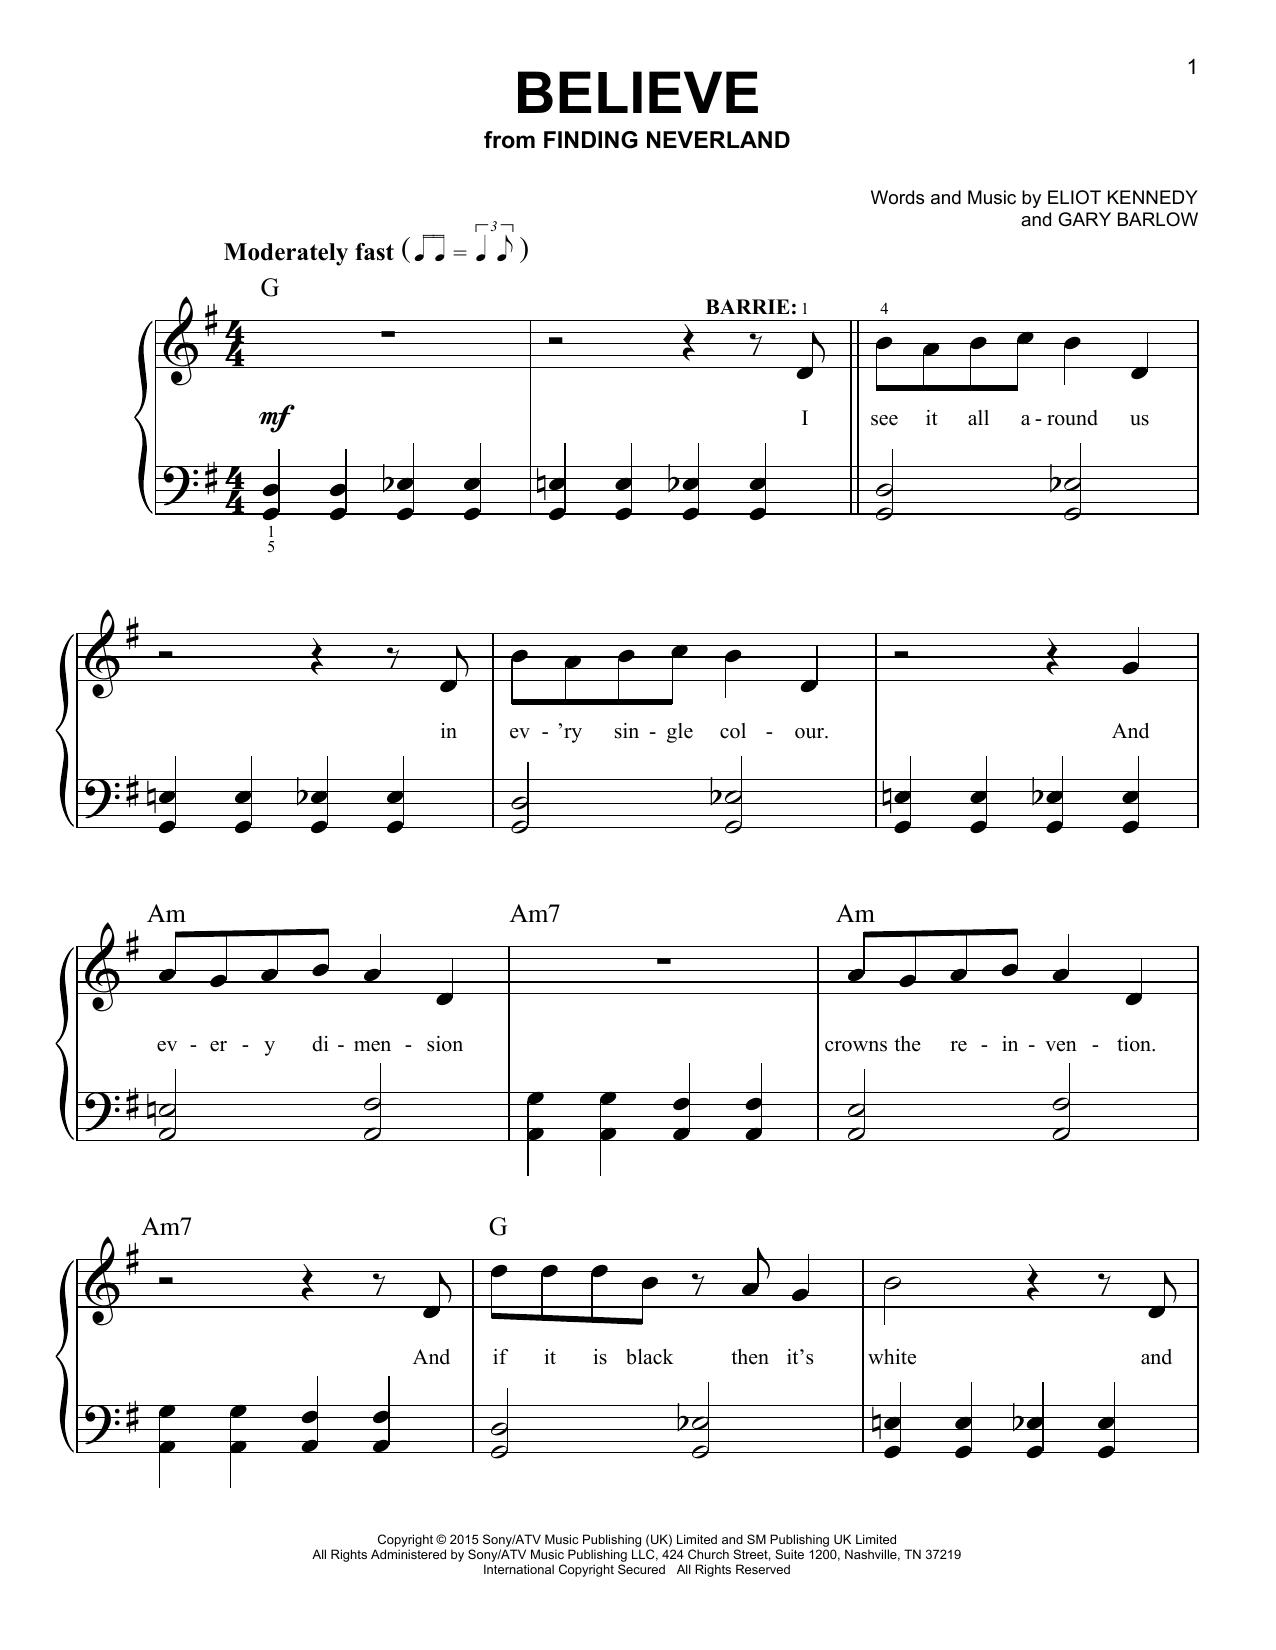 Gary Barlow & Eliot Kennedy - Believe